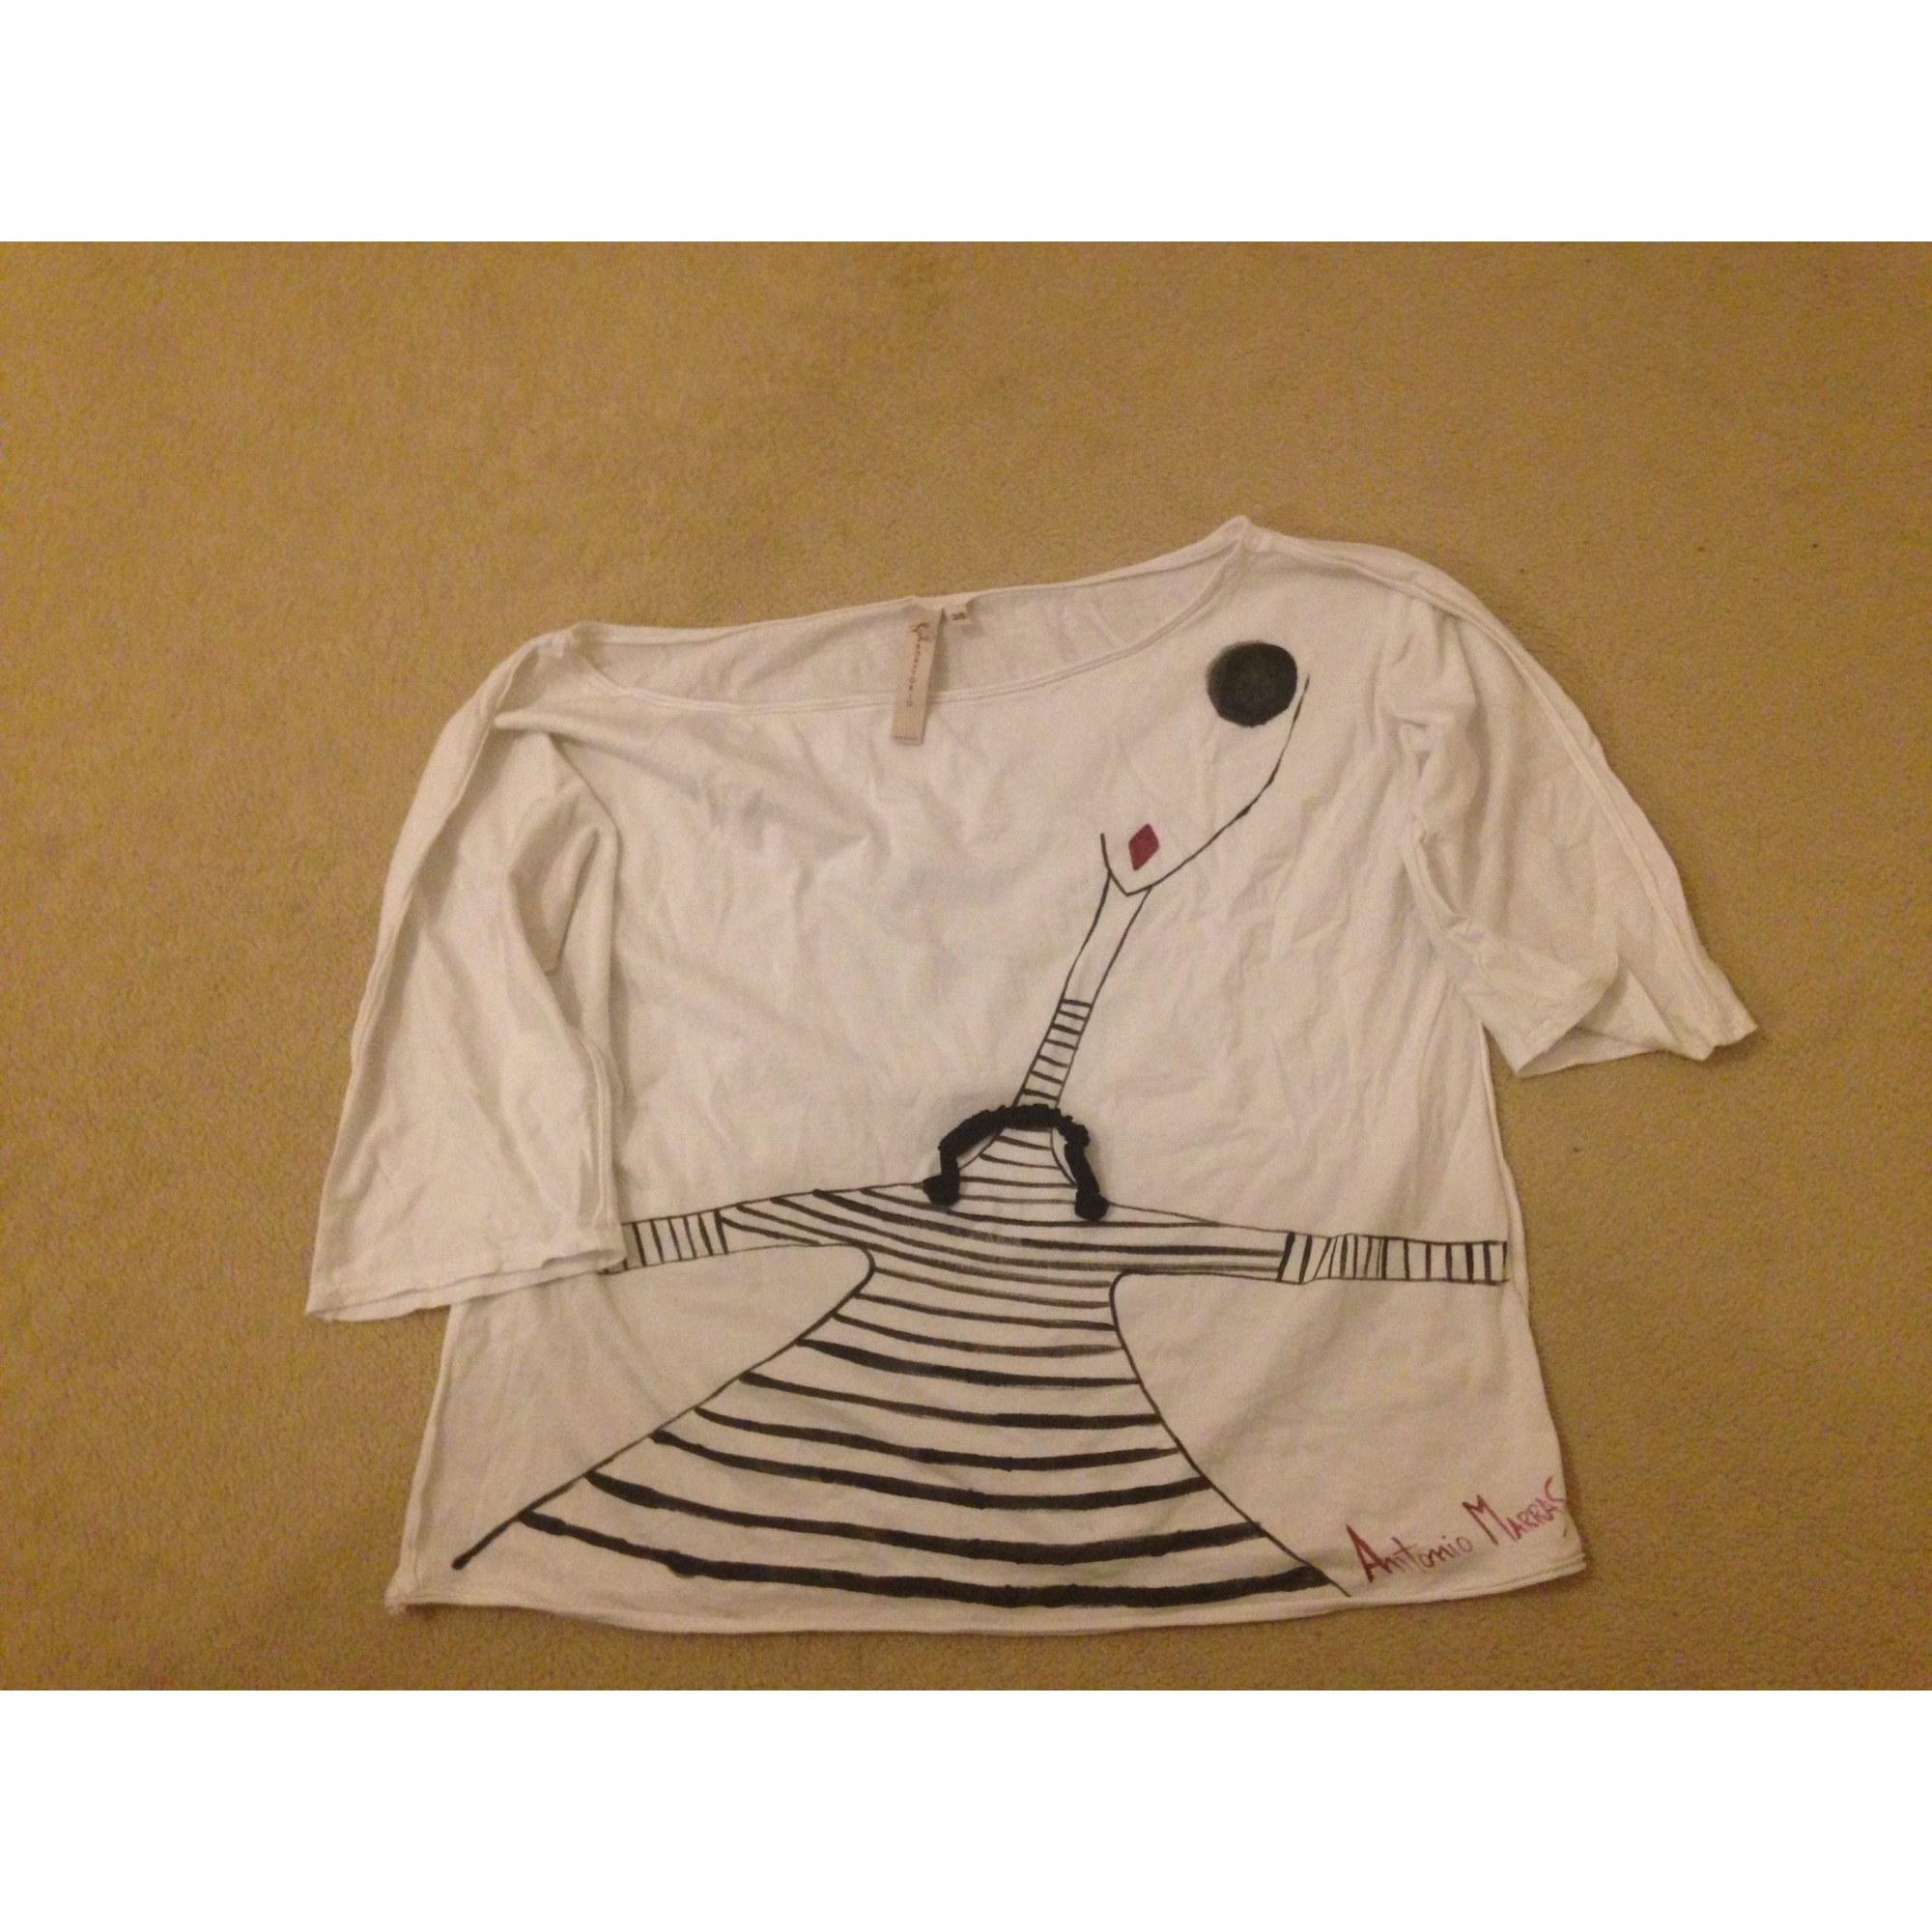 Shirt Blanc Top Marras Antonio Blanc Tee Écru Cassé 55qIrwA